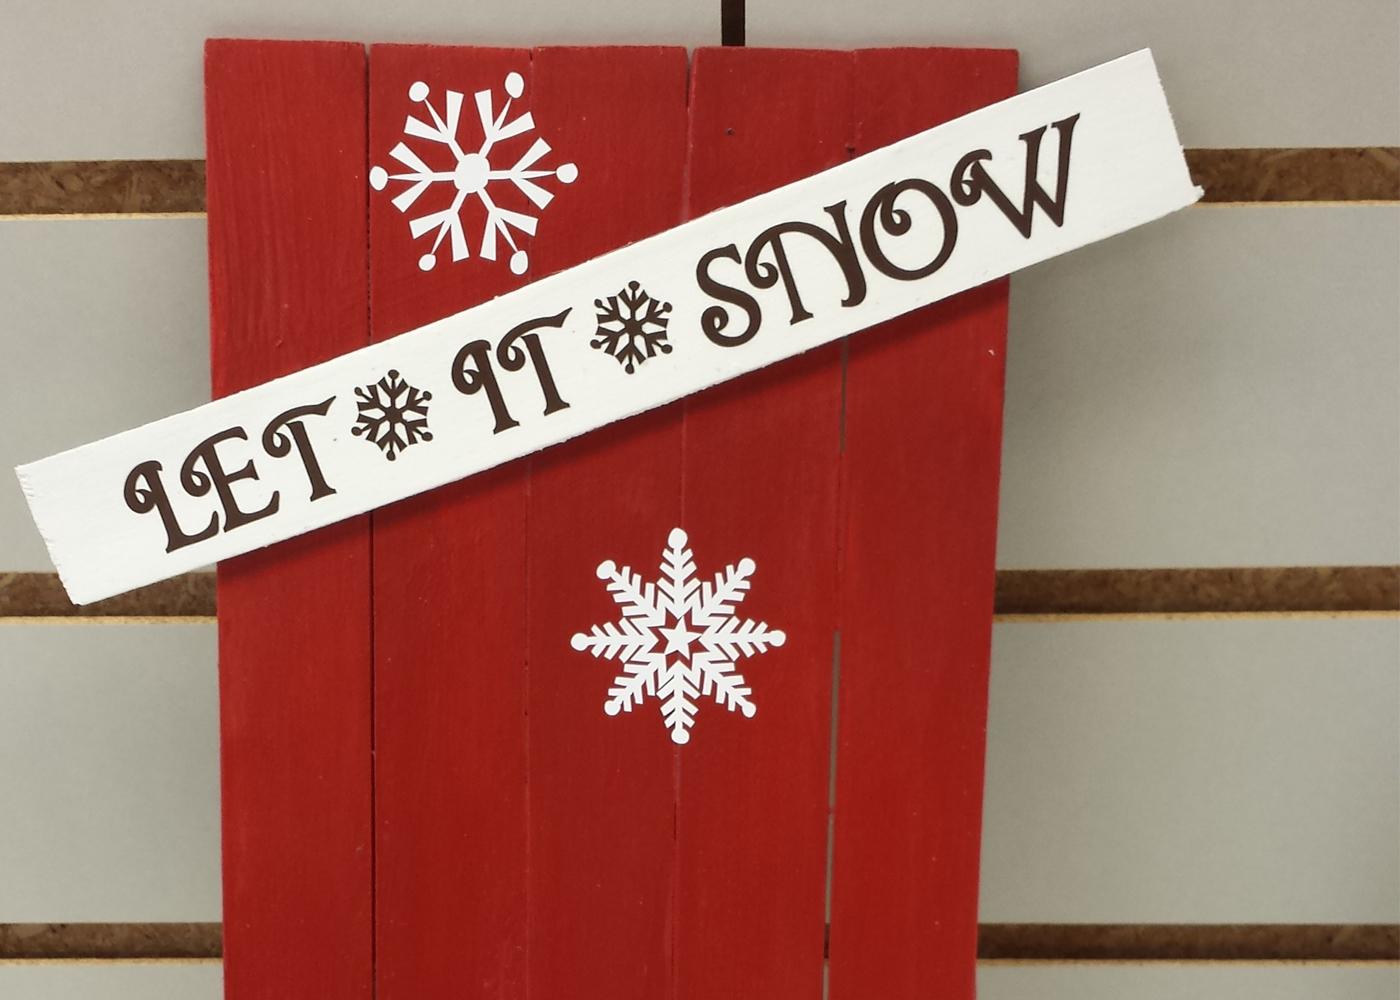 wd374-snowflake-winter-theme-decal-vinyl-sticker-set-2-.jpg